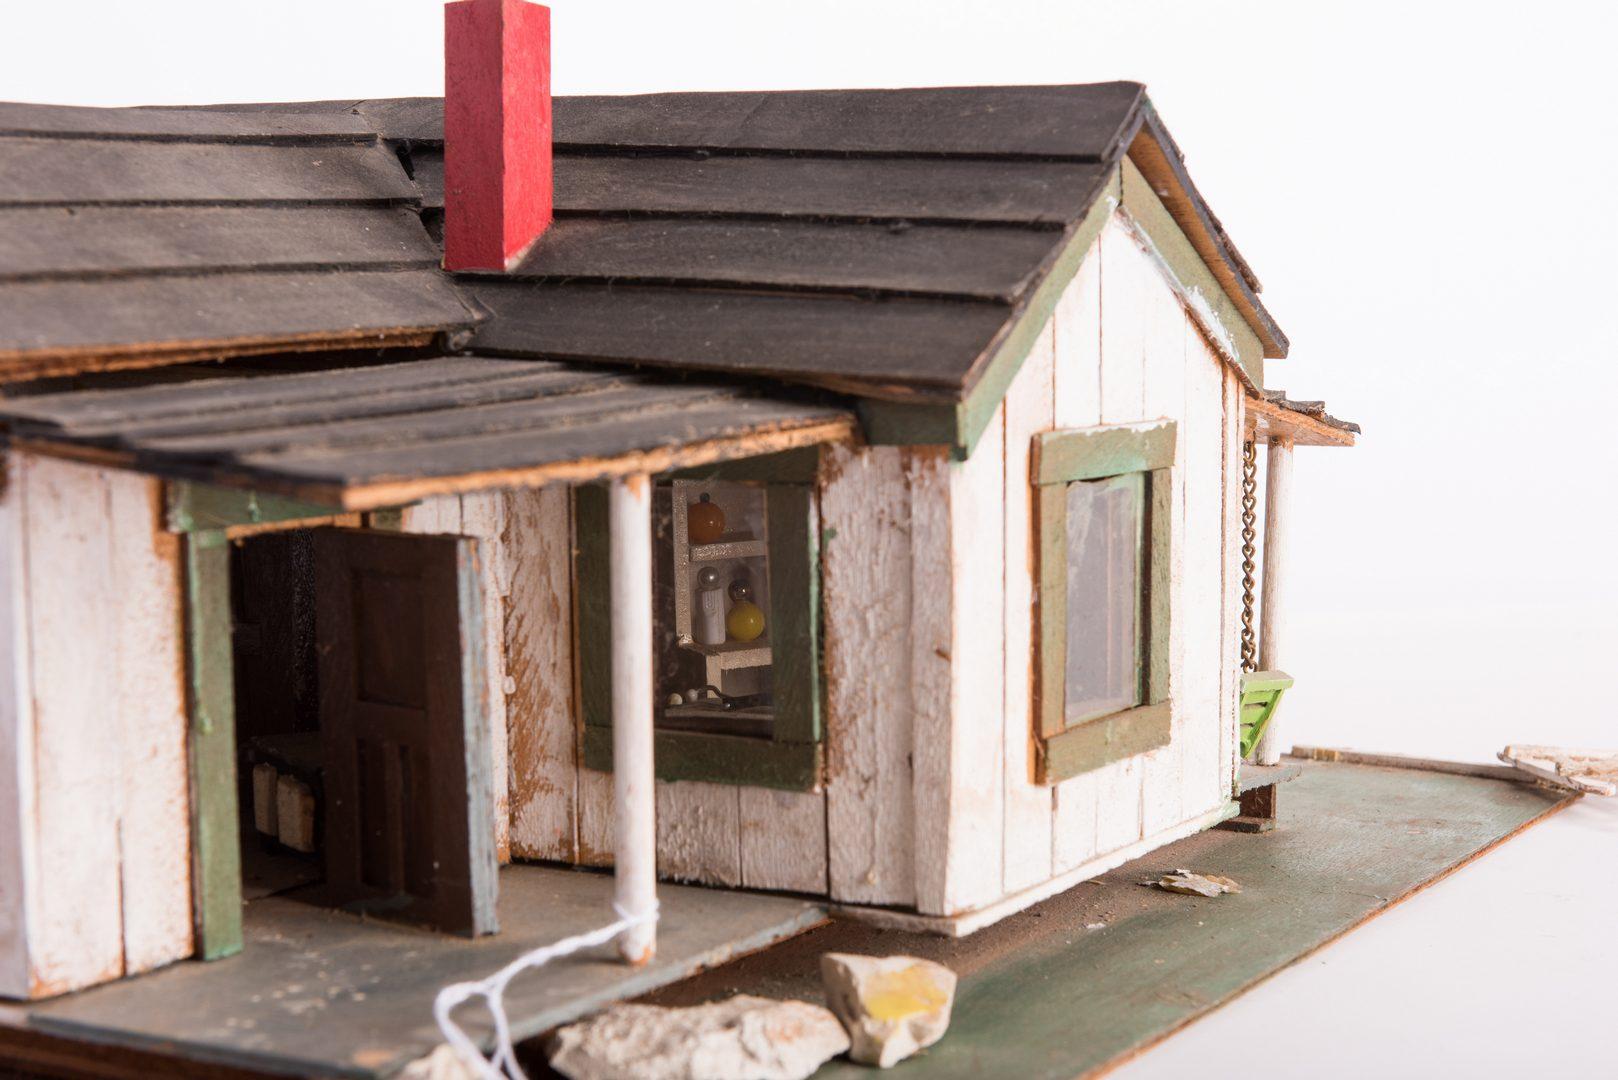 Lot 193: 2 Folk Art Building Assemblages